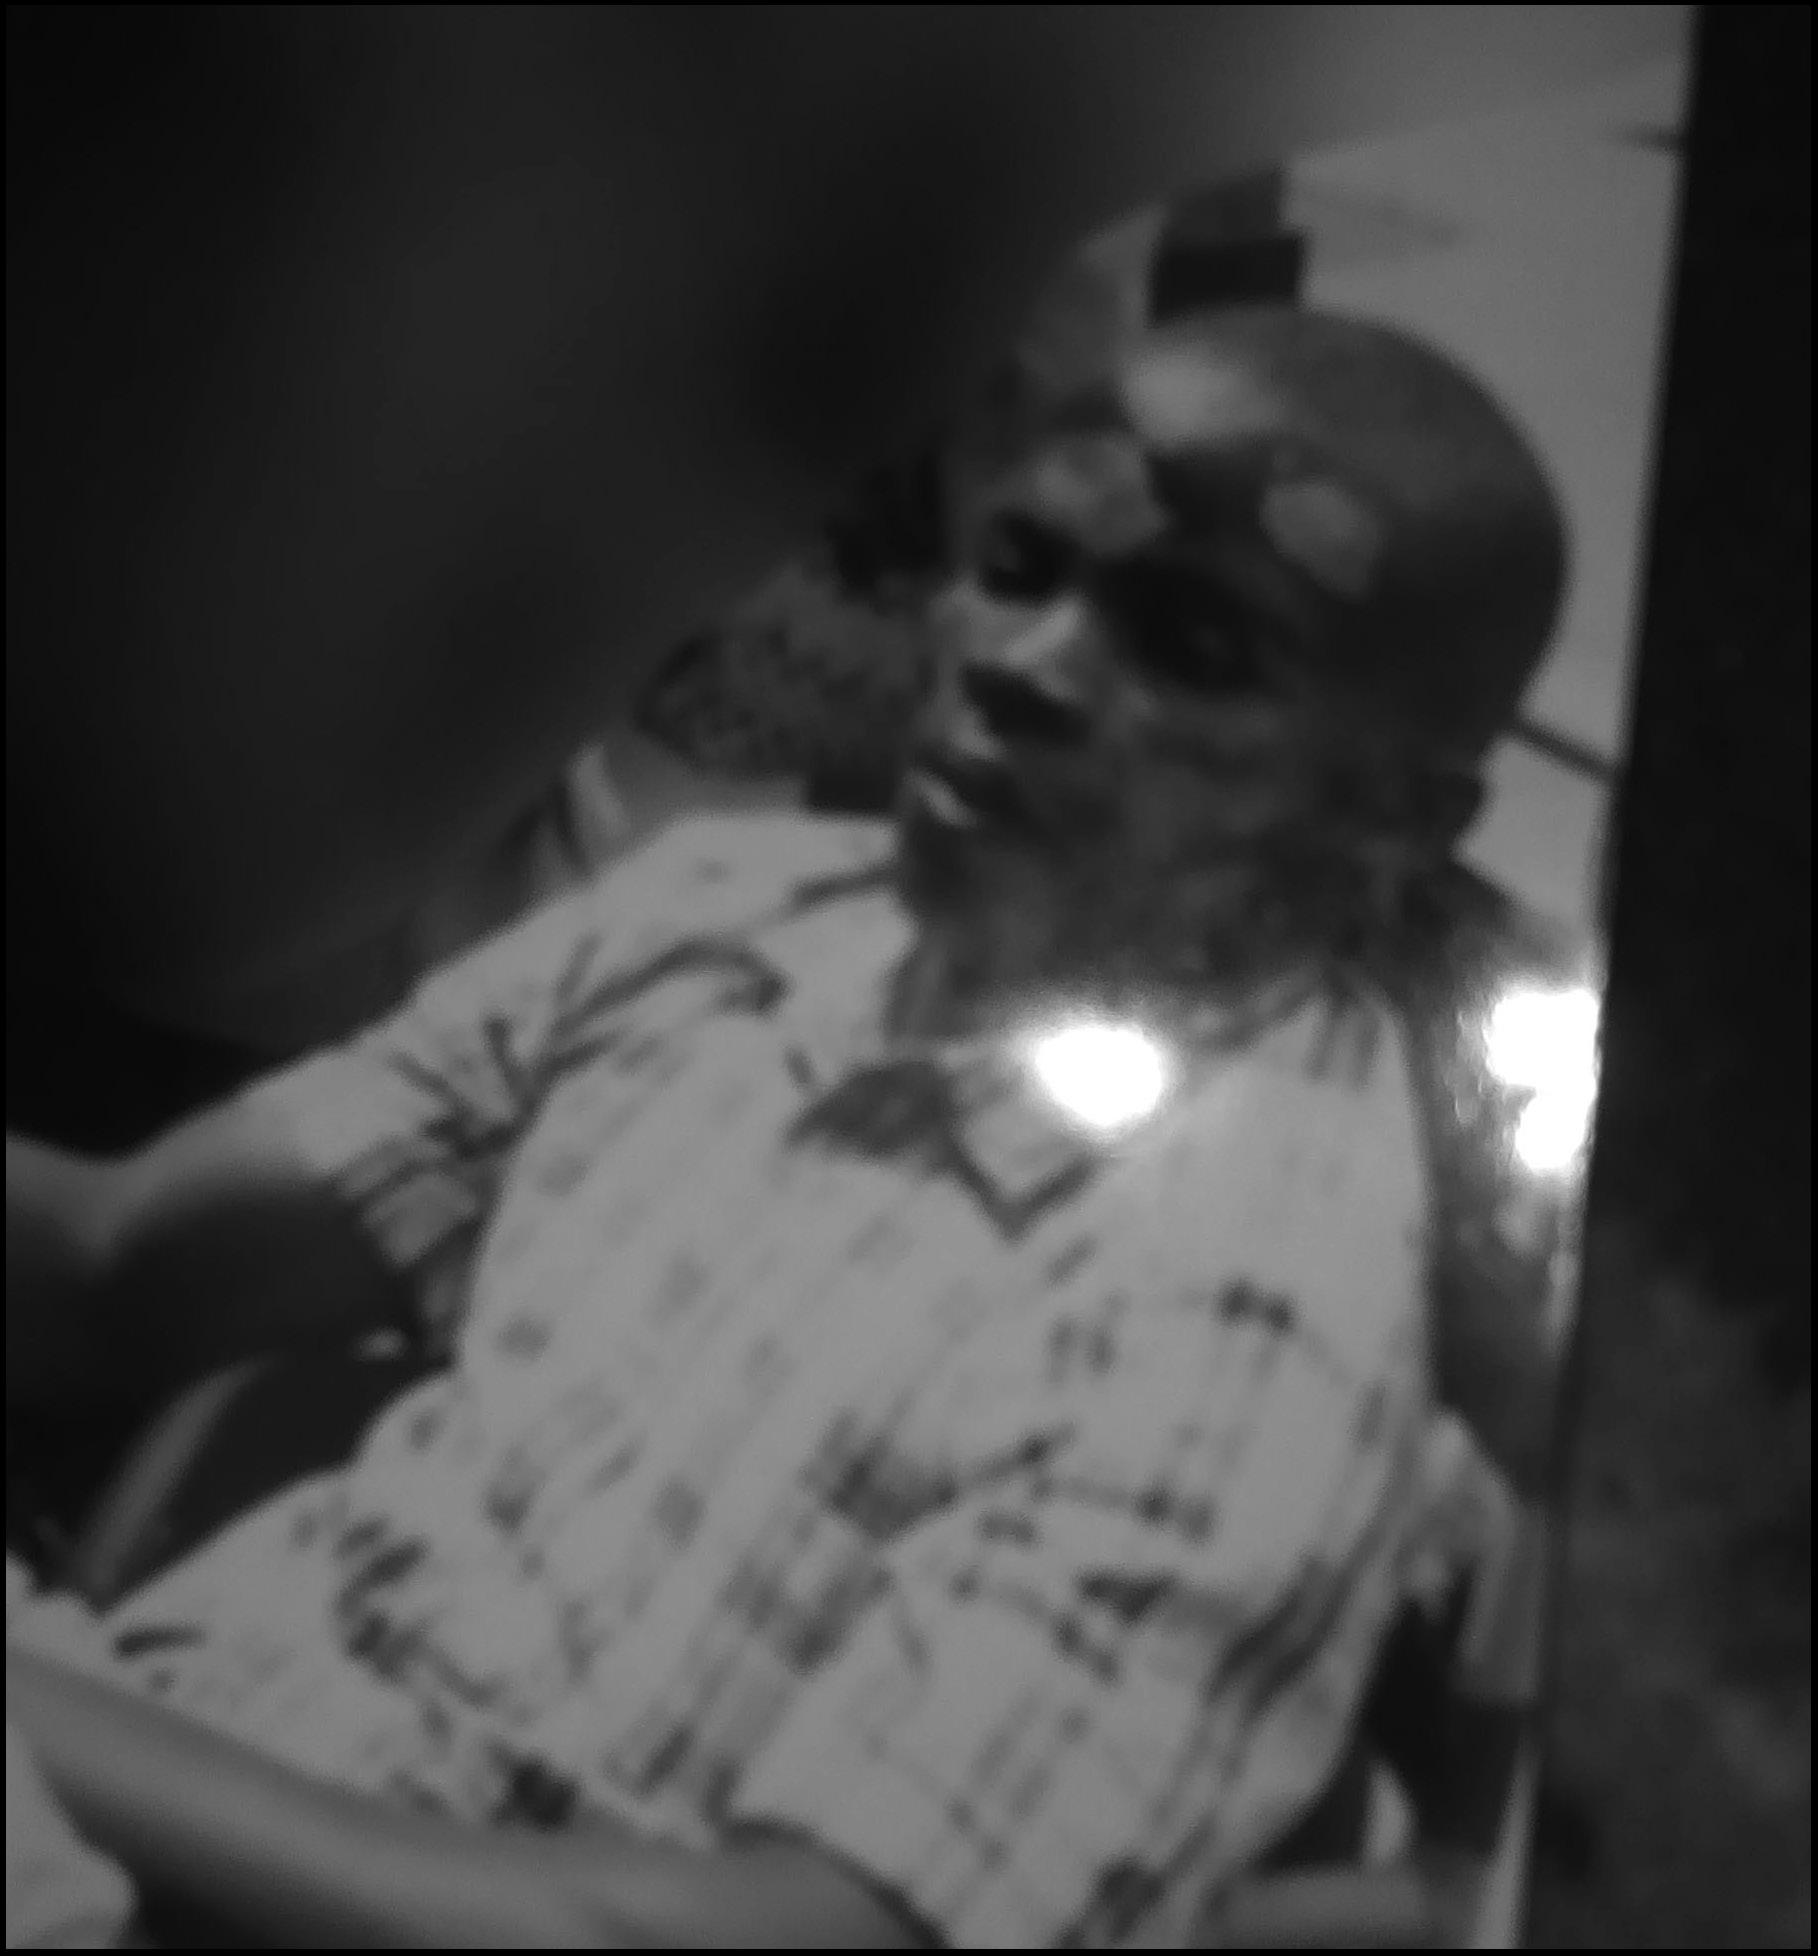 Uyu  itangishaka yahiriye mw'iduka rya Ndanyuzwe none asaba indishyi z'akababaro[photo archieves]